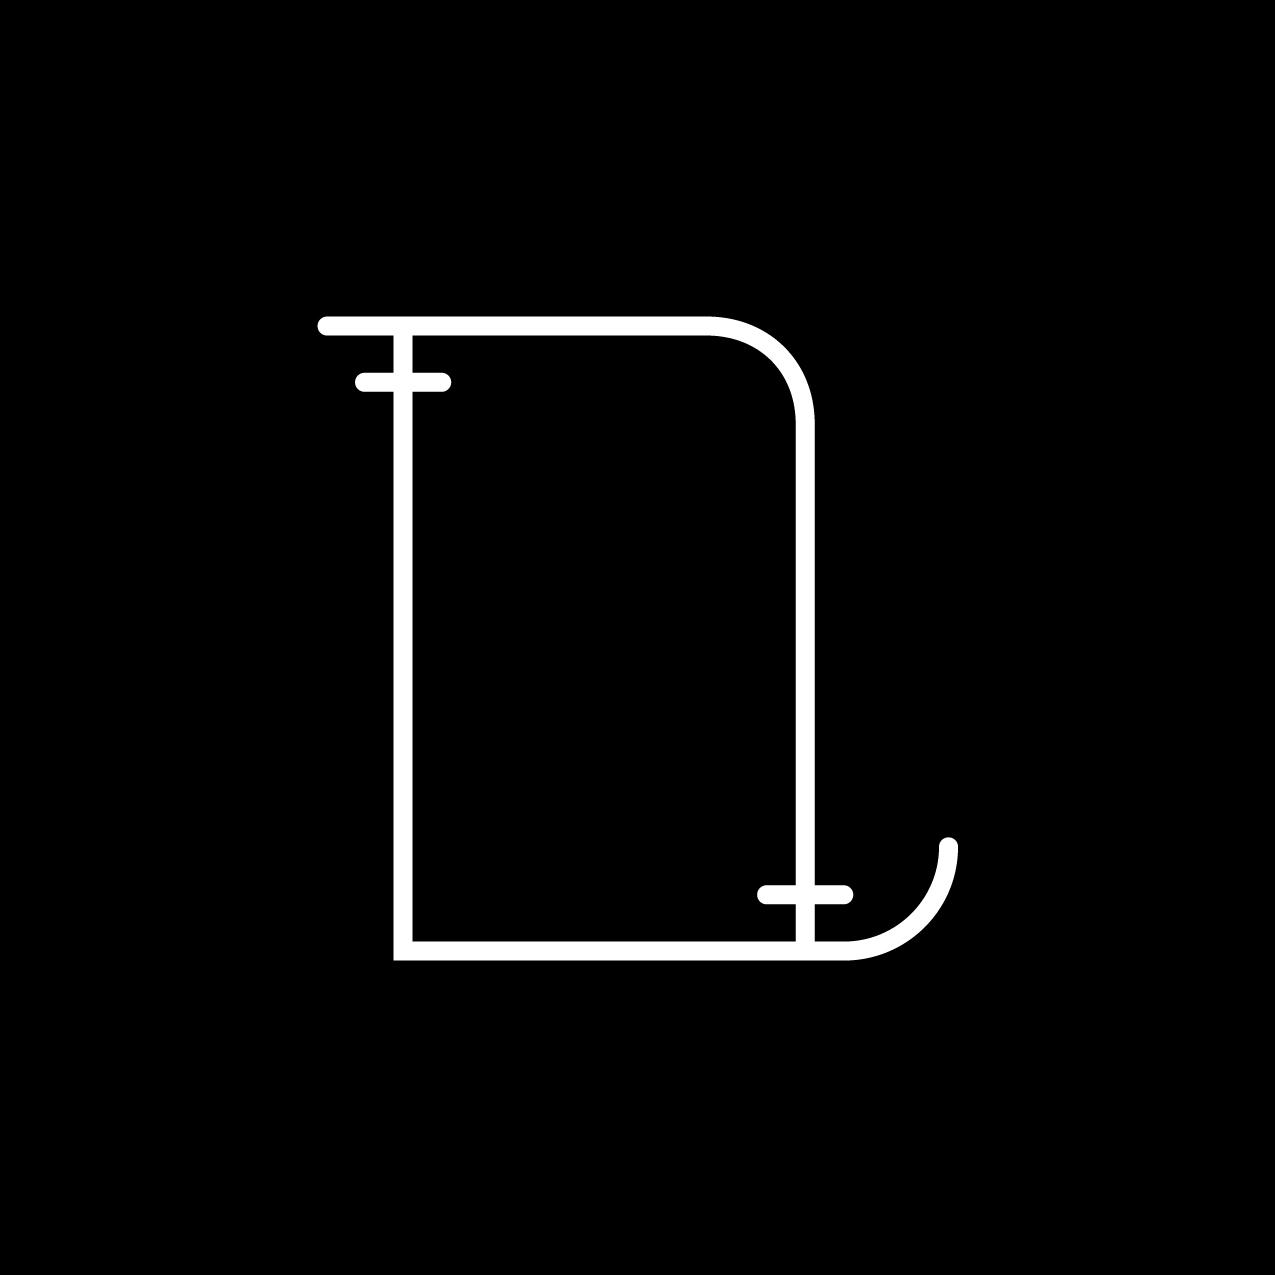 Letter L12 Design by Furia